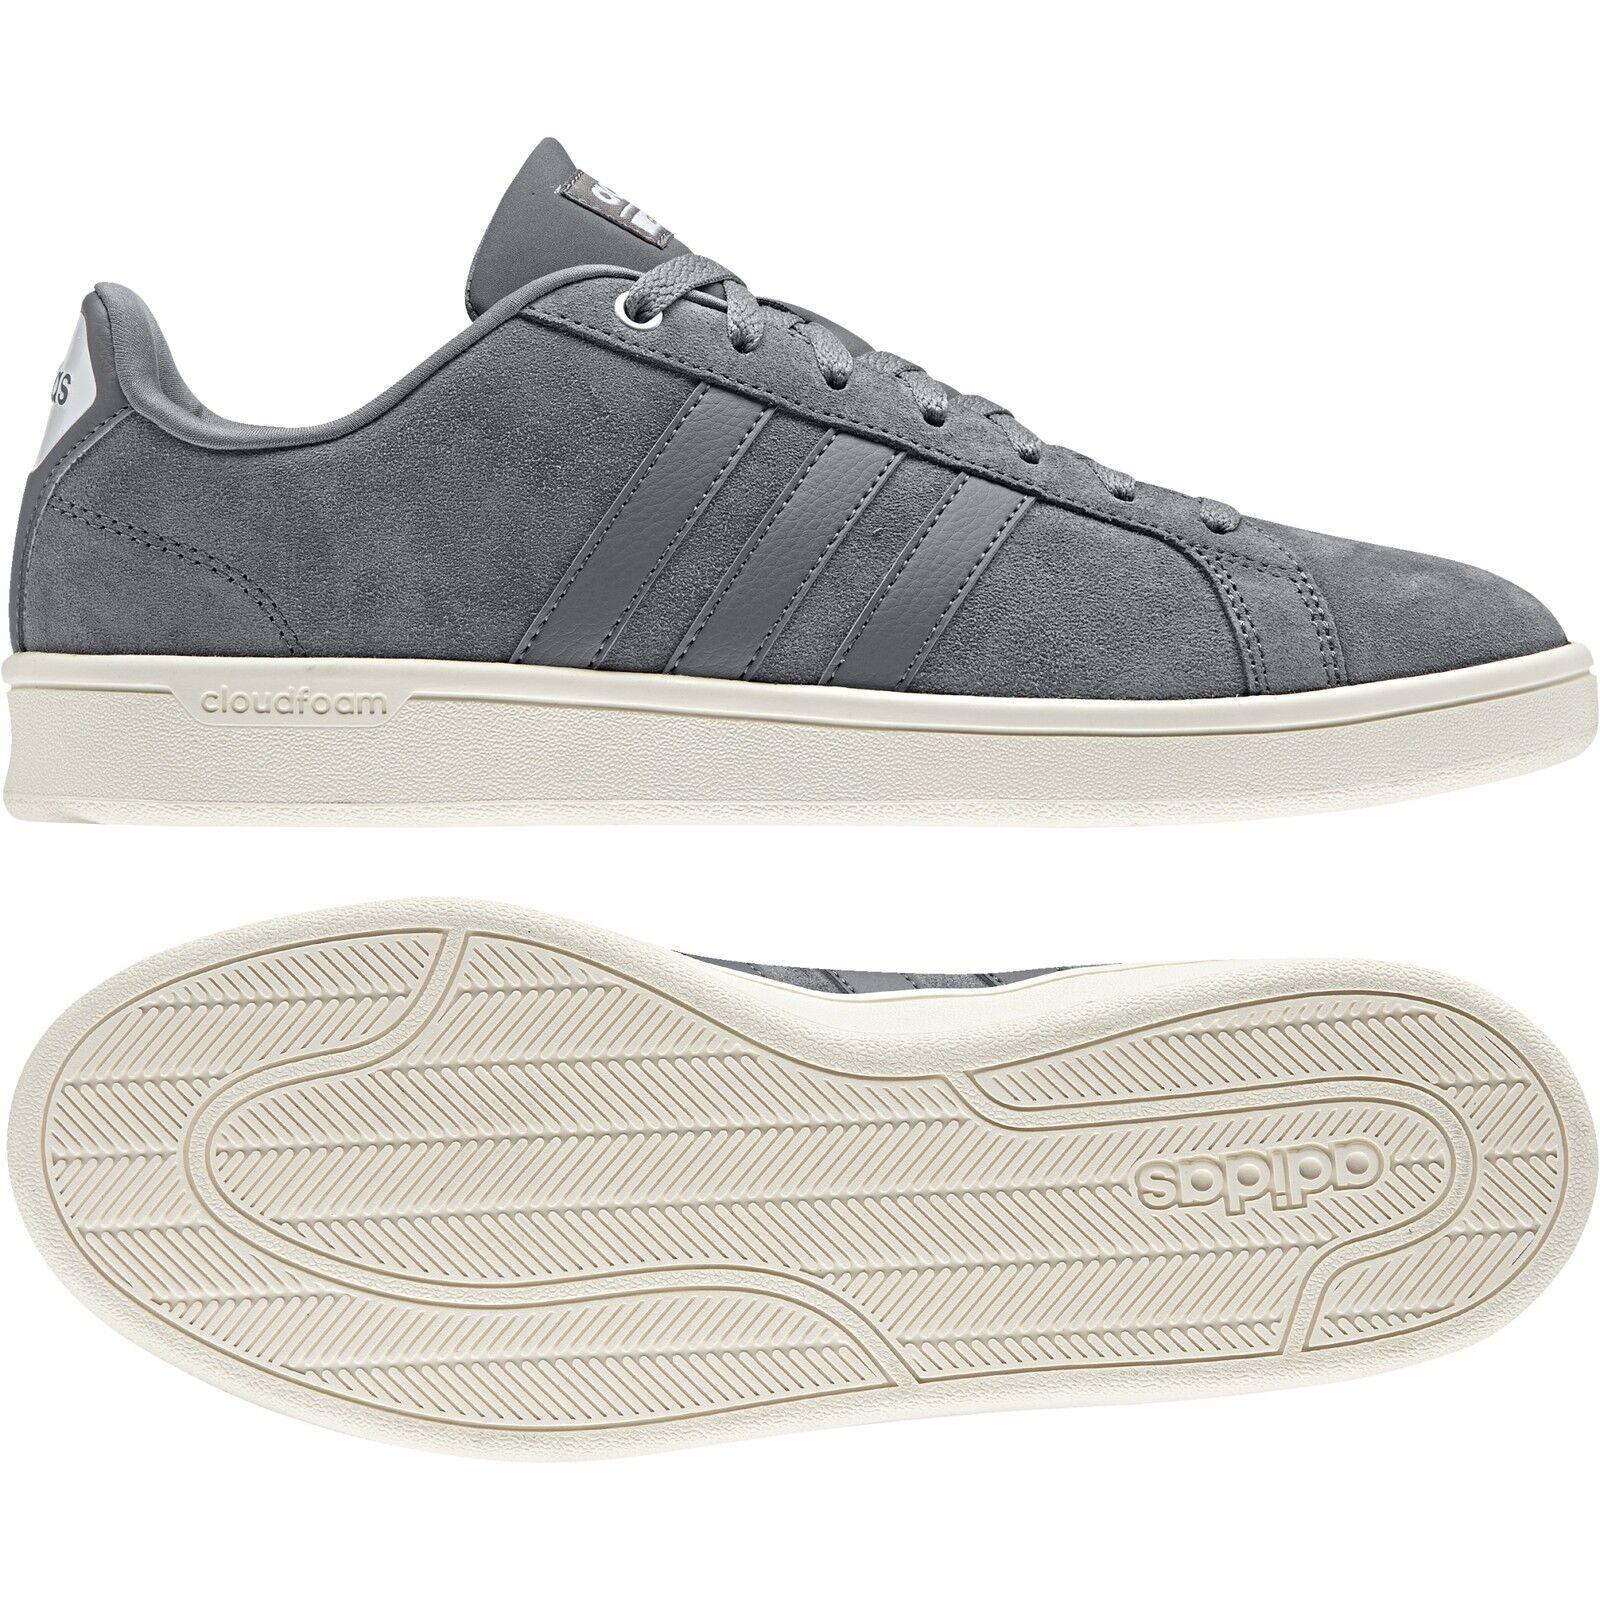 ADIDAS CLOUDFOAM ADVANTAGE grey/white  AW3921  NEO Sneaker Sportschuhe